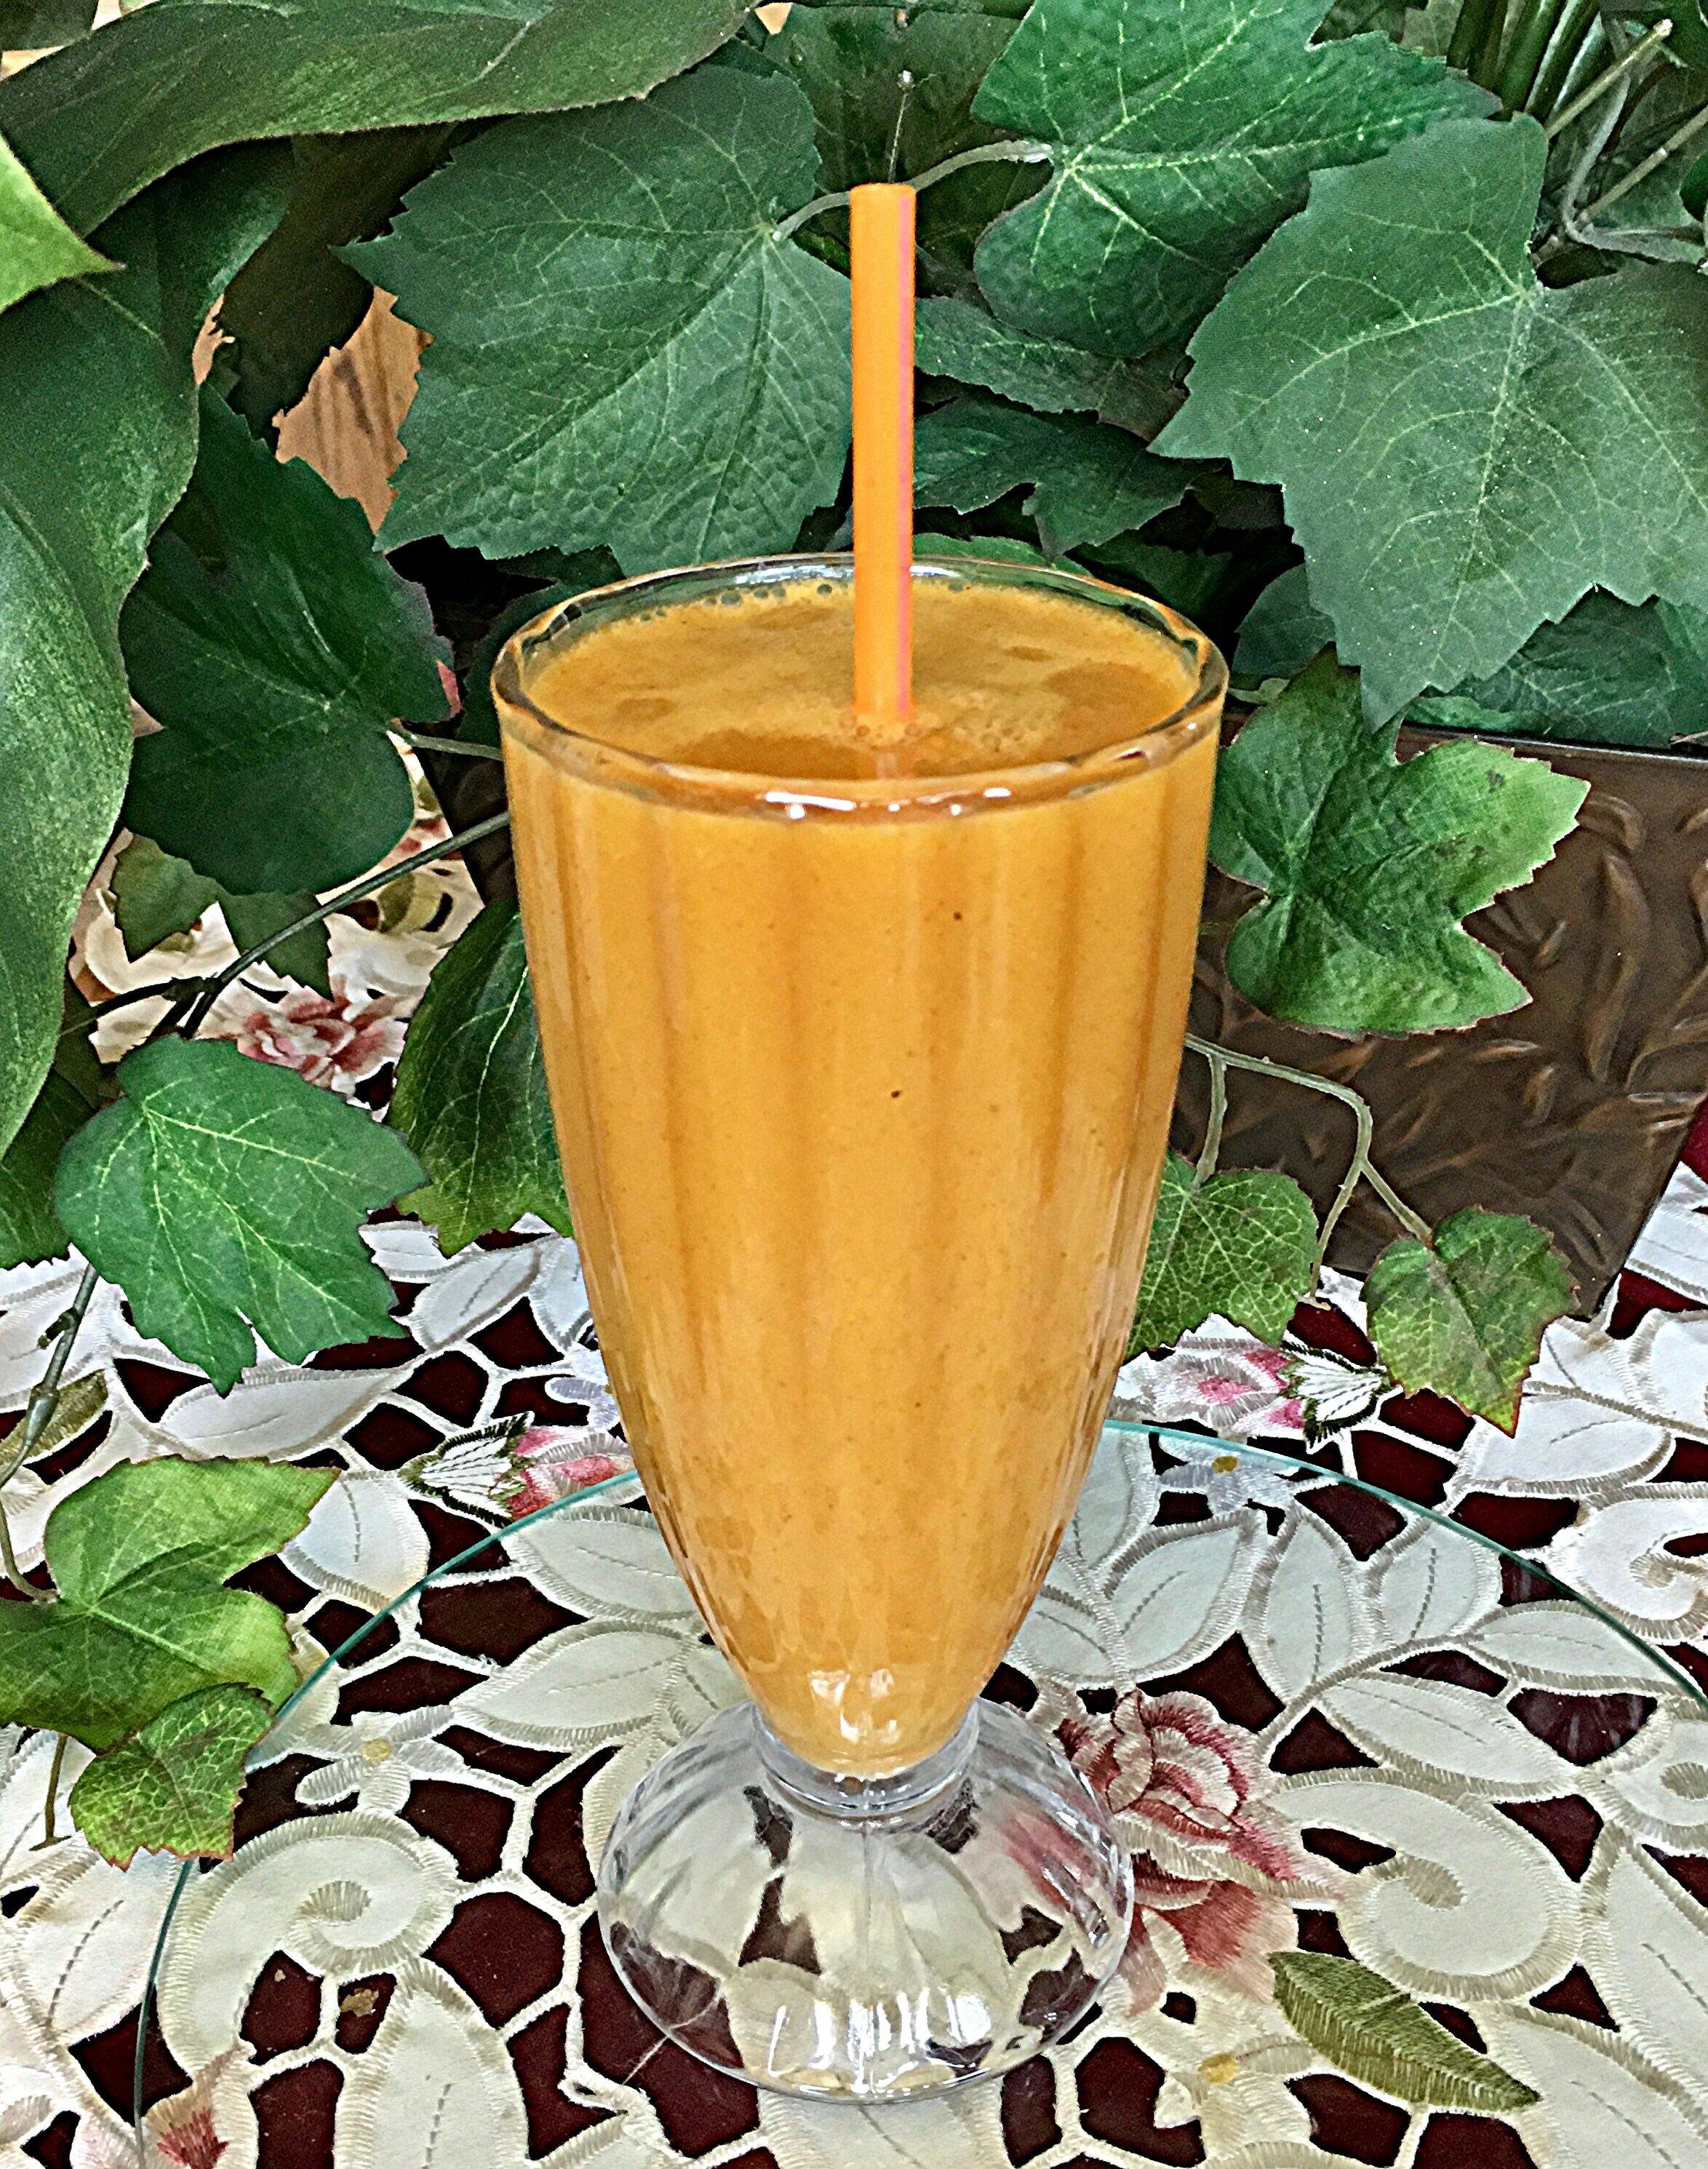 Wizard's Pumpkin Juice Yoly